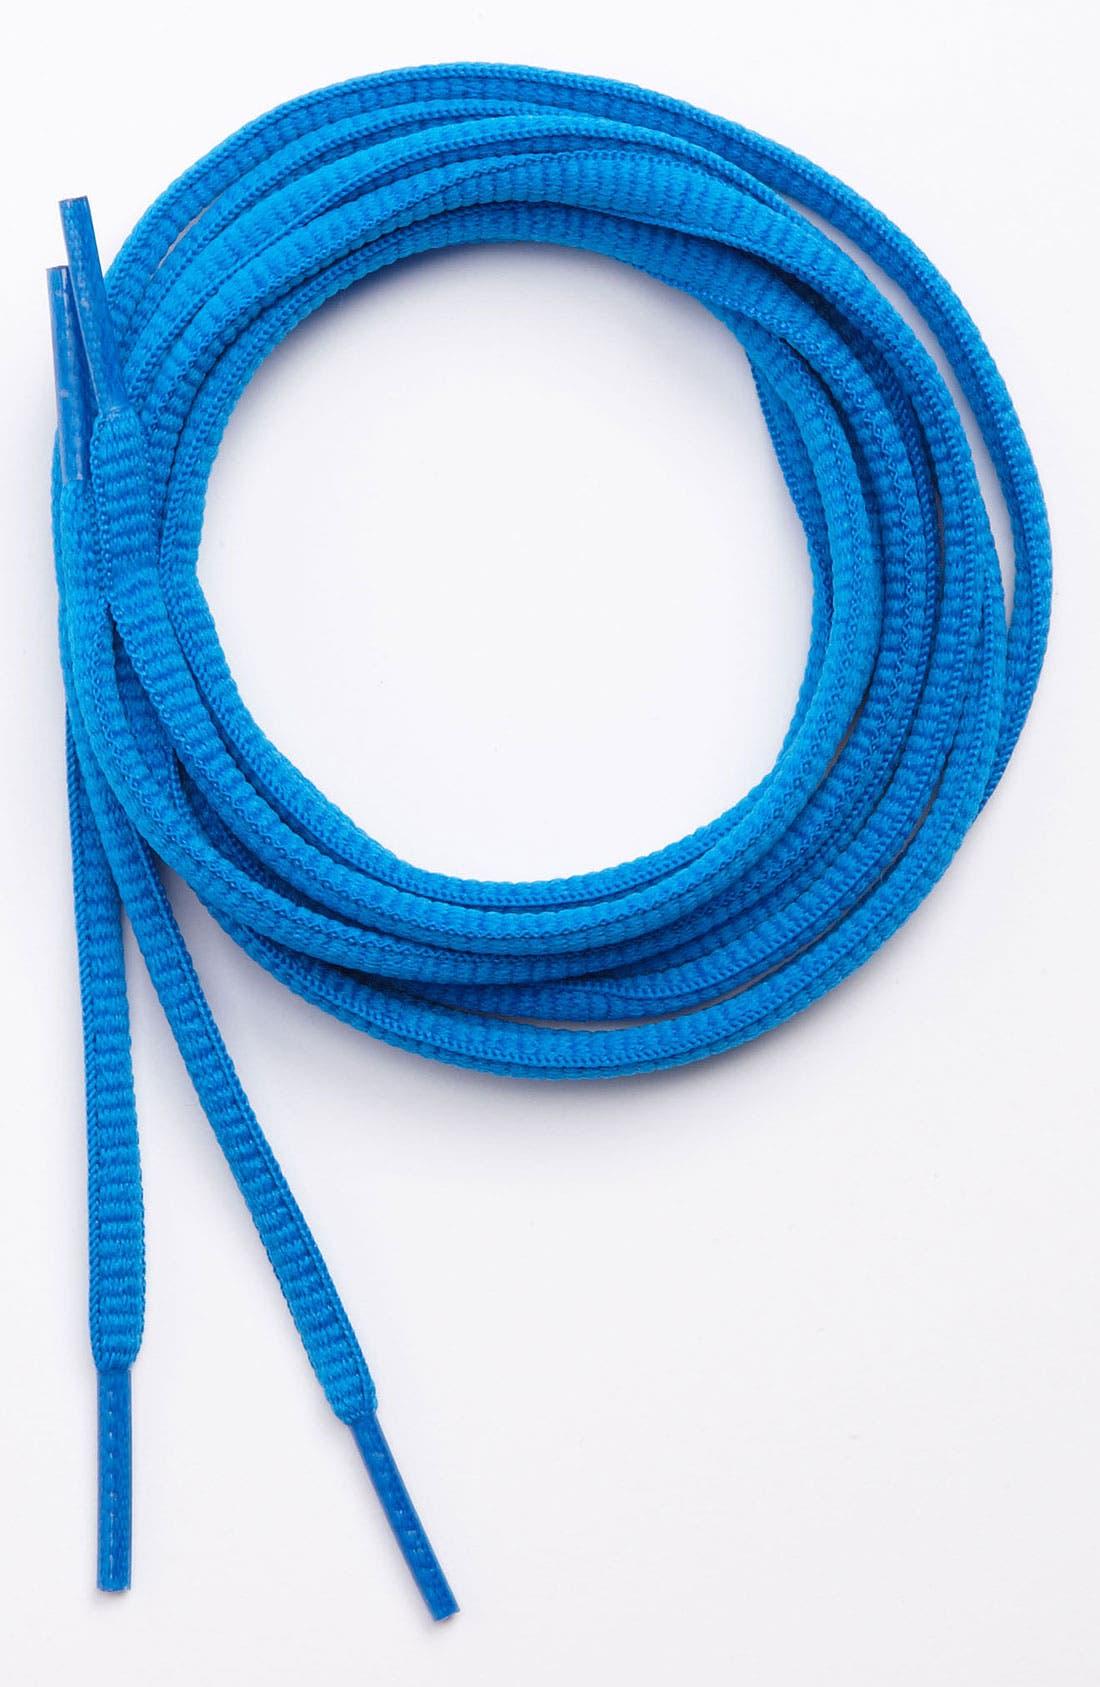 Main Image - Nordstrom 'Oval' Shoelaces (Little Kid & Big Kid)